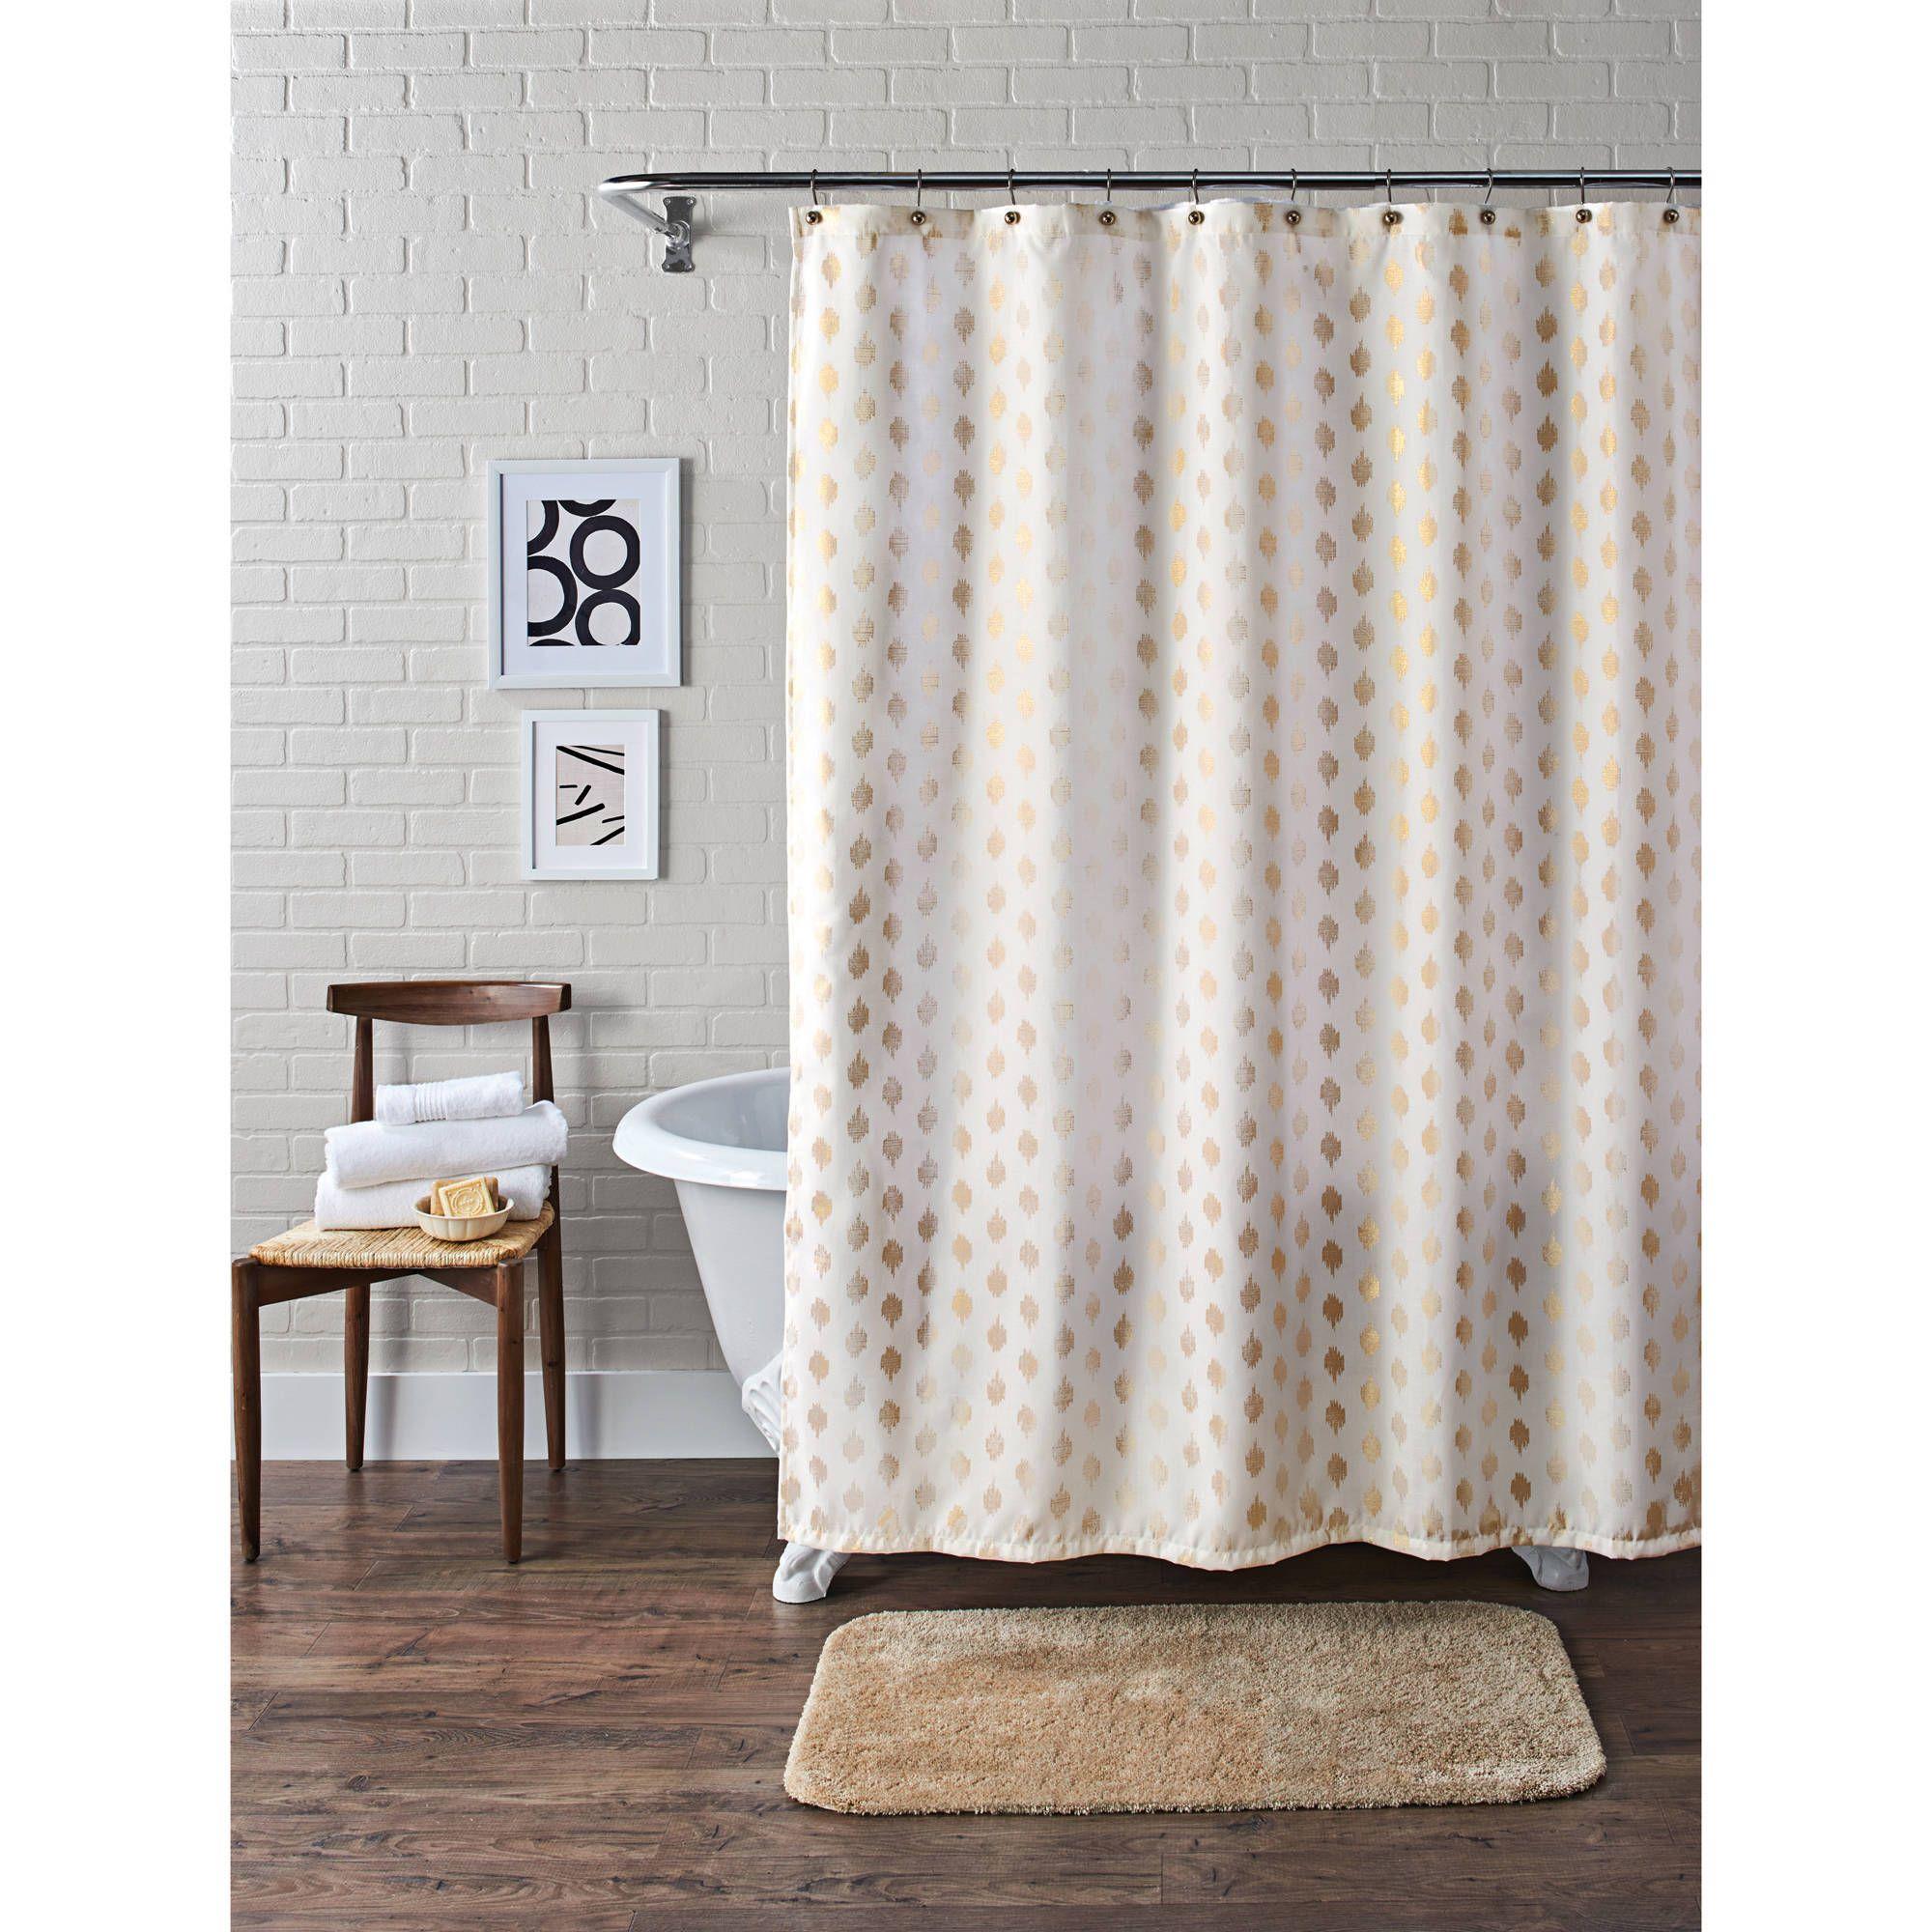 Home Fabric Shower Curtains Shower Curtains Walmart Bathroom Ideas Uk